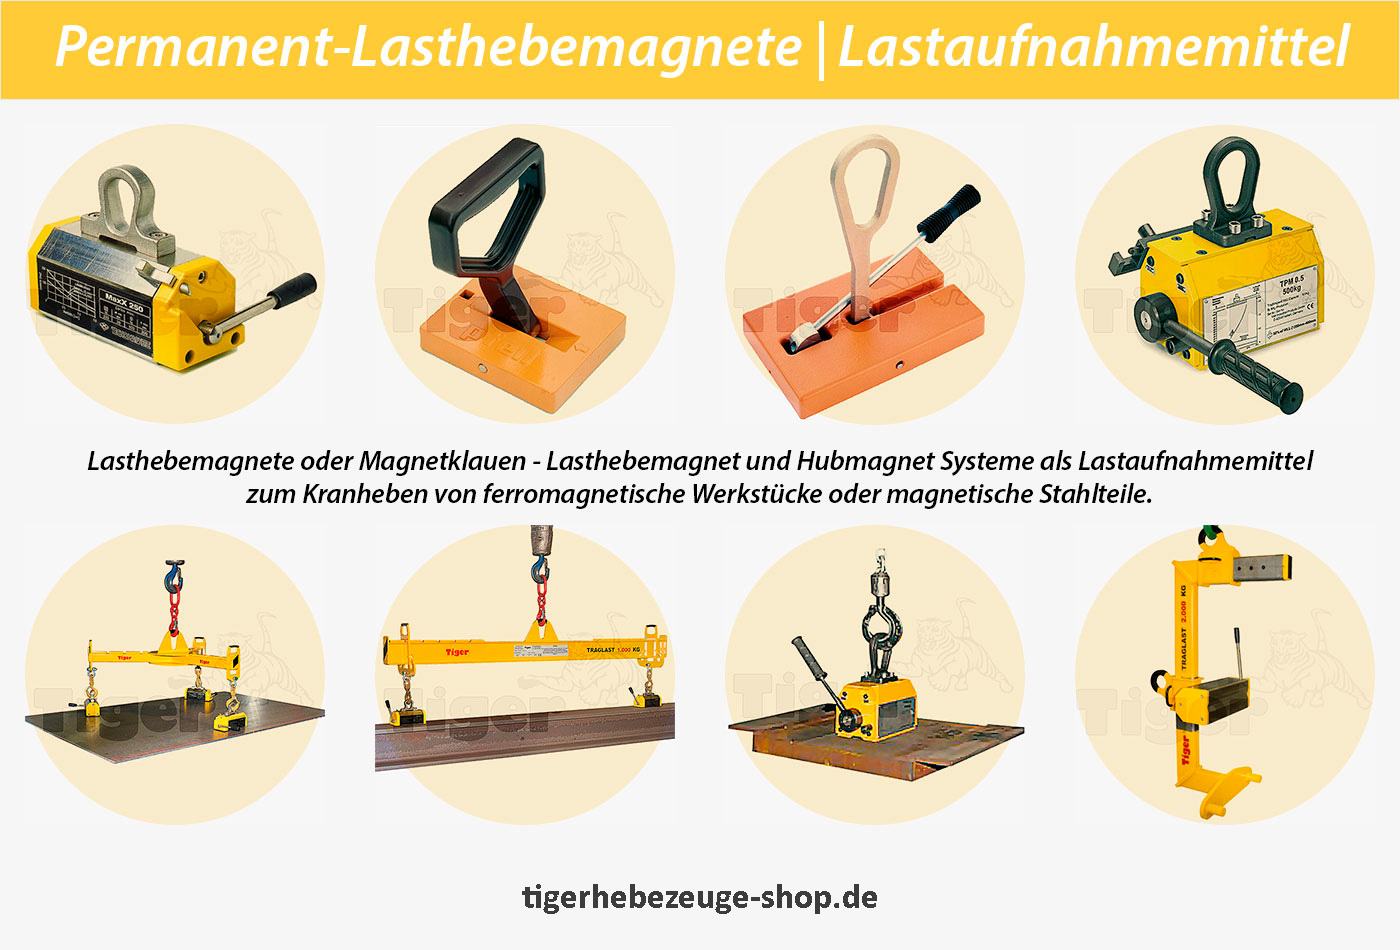 Permanent Lasthebemagnete